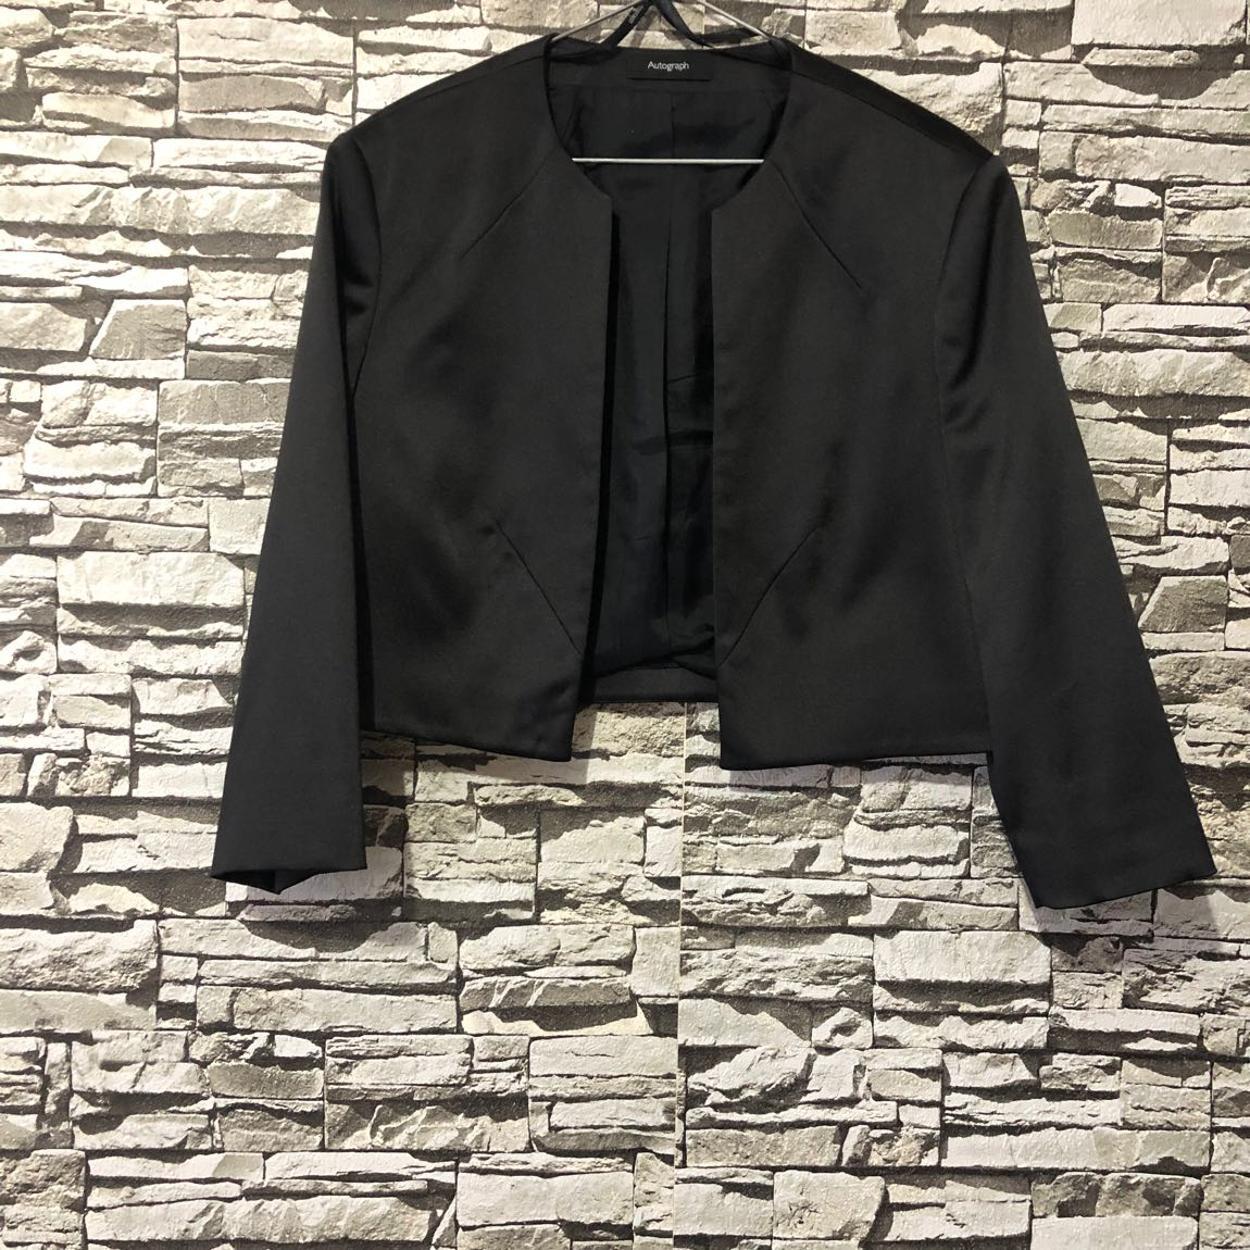 Marks & Spencer Ceket/Blazer